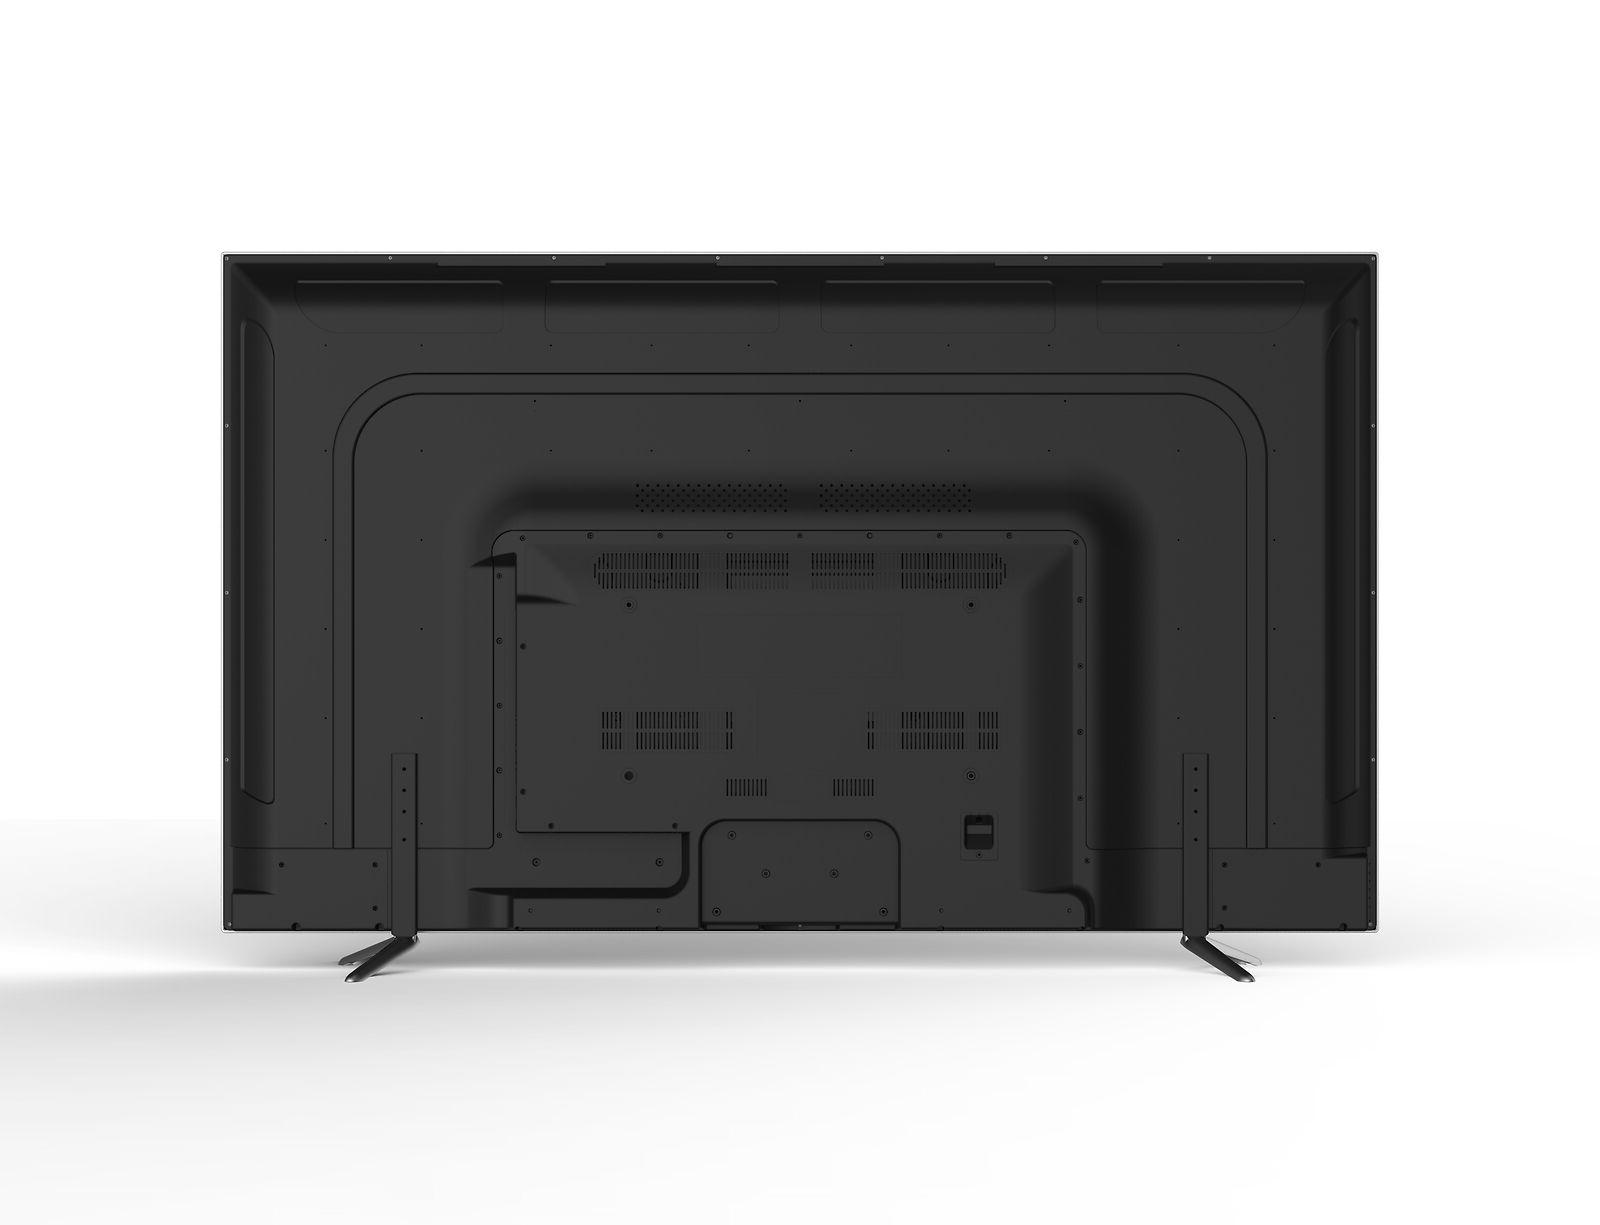 RCA inch LED TV 4 HDMI Ultra HD RTU6050 2-Day